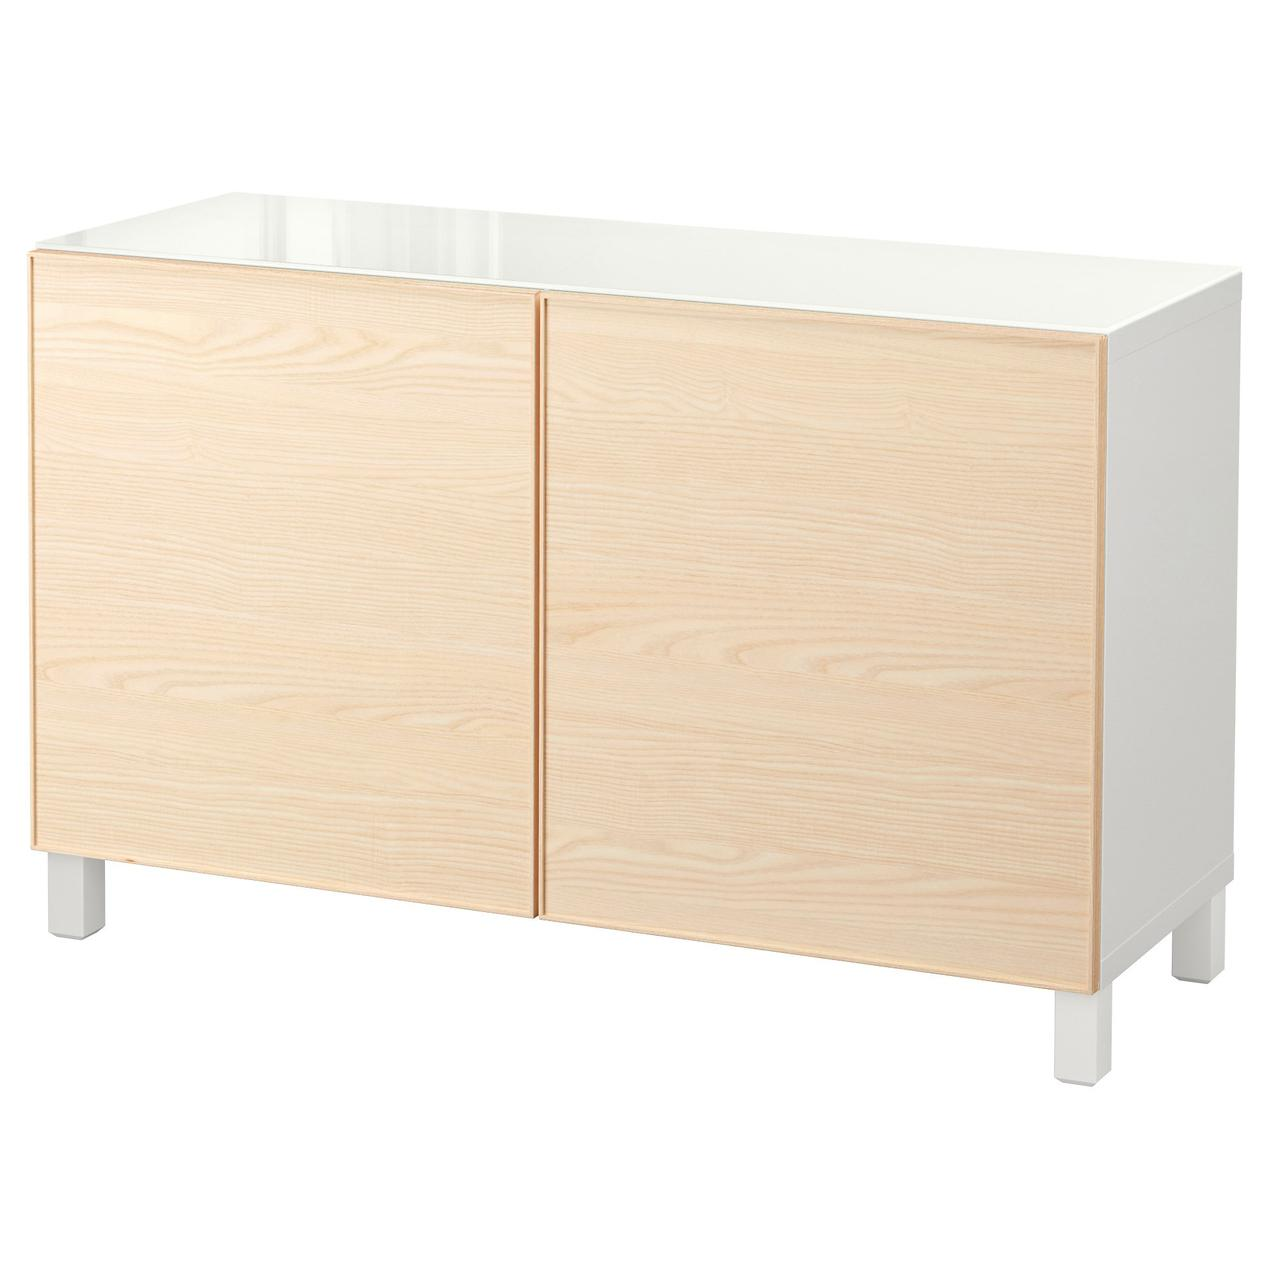 Тумба IKEA BESTÅ 120x40x74 см Inviken белая ясеневый шпон 092.111.21